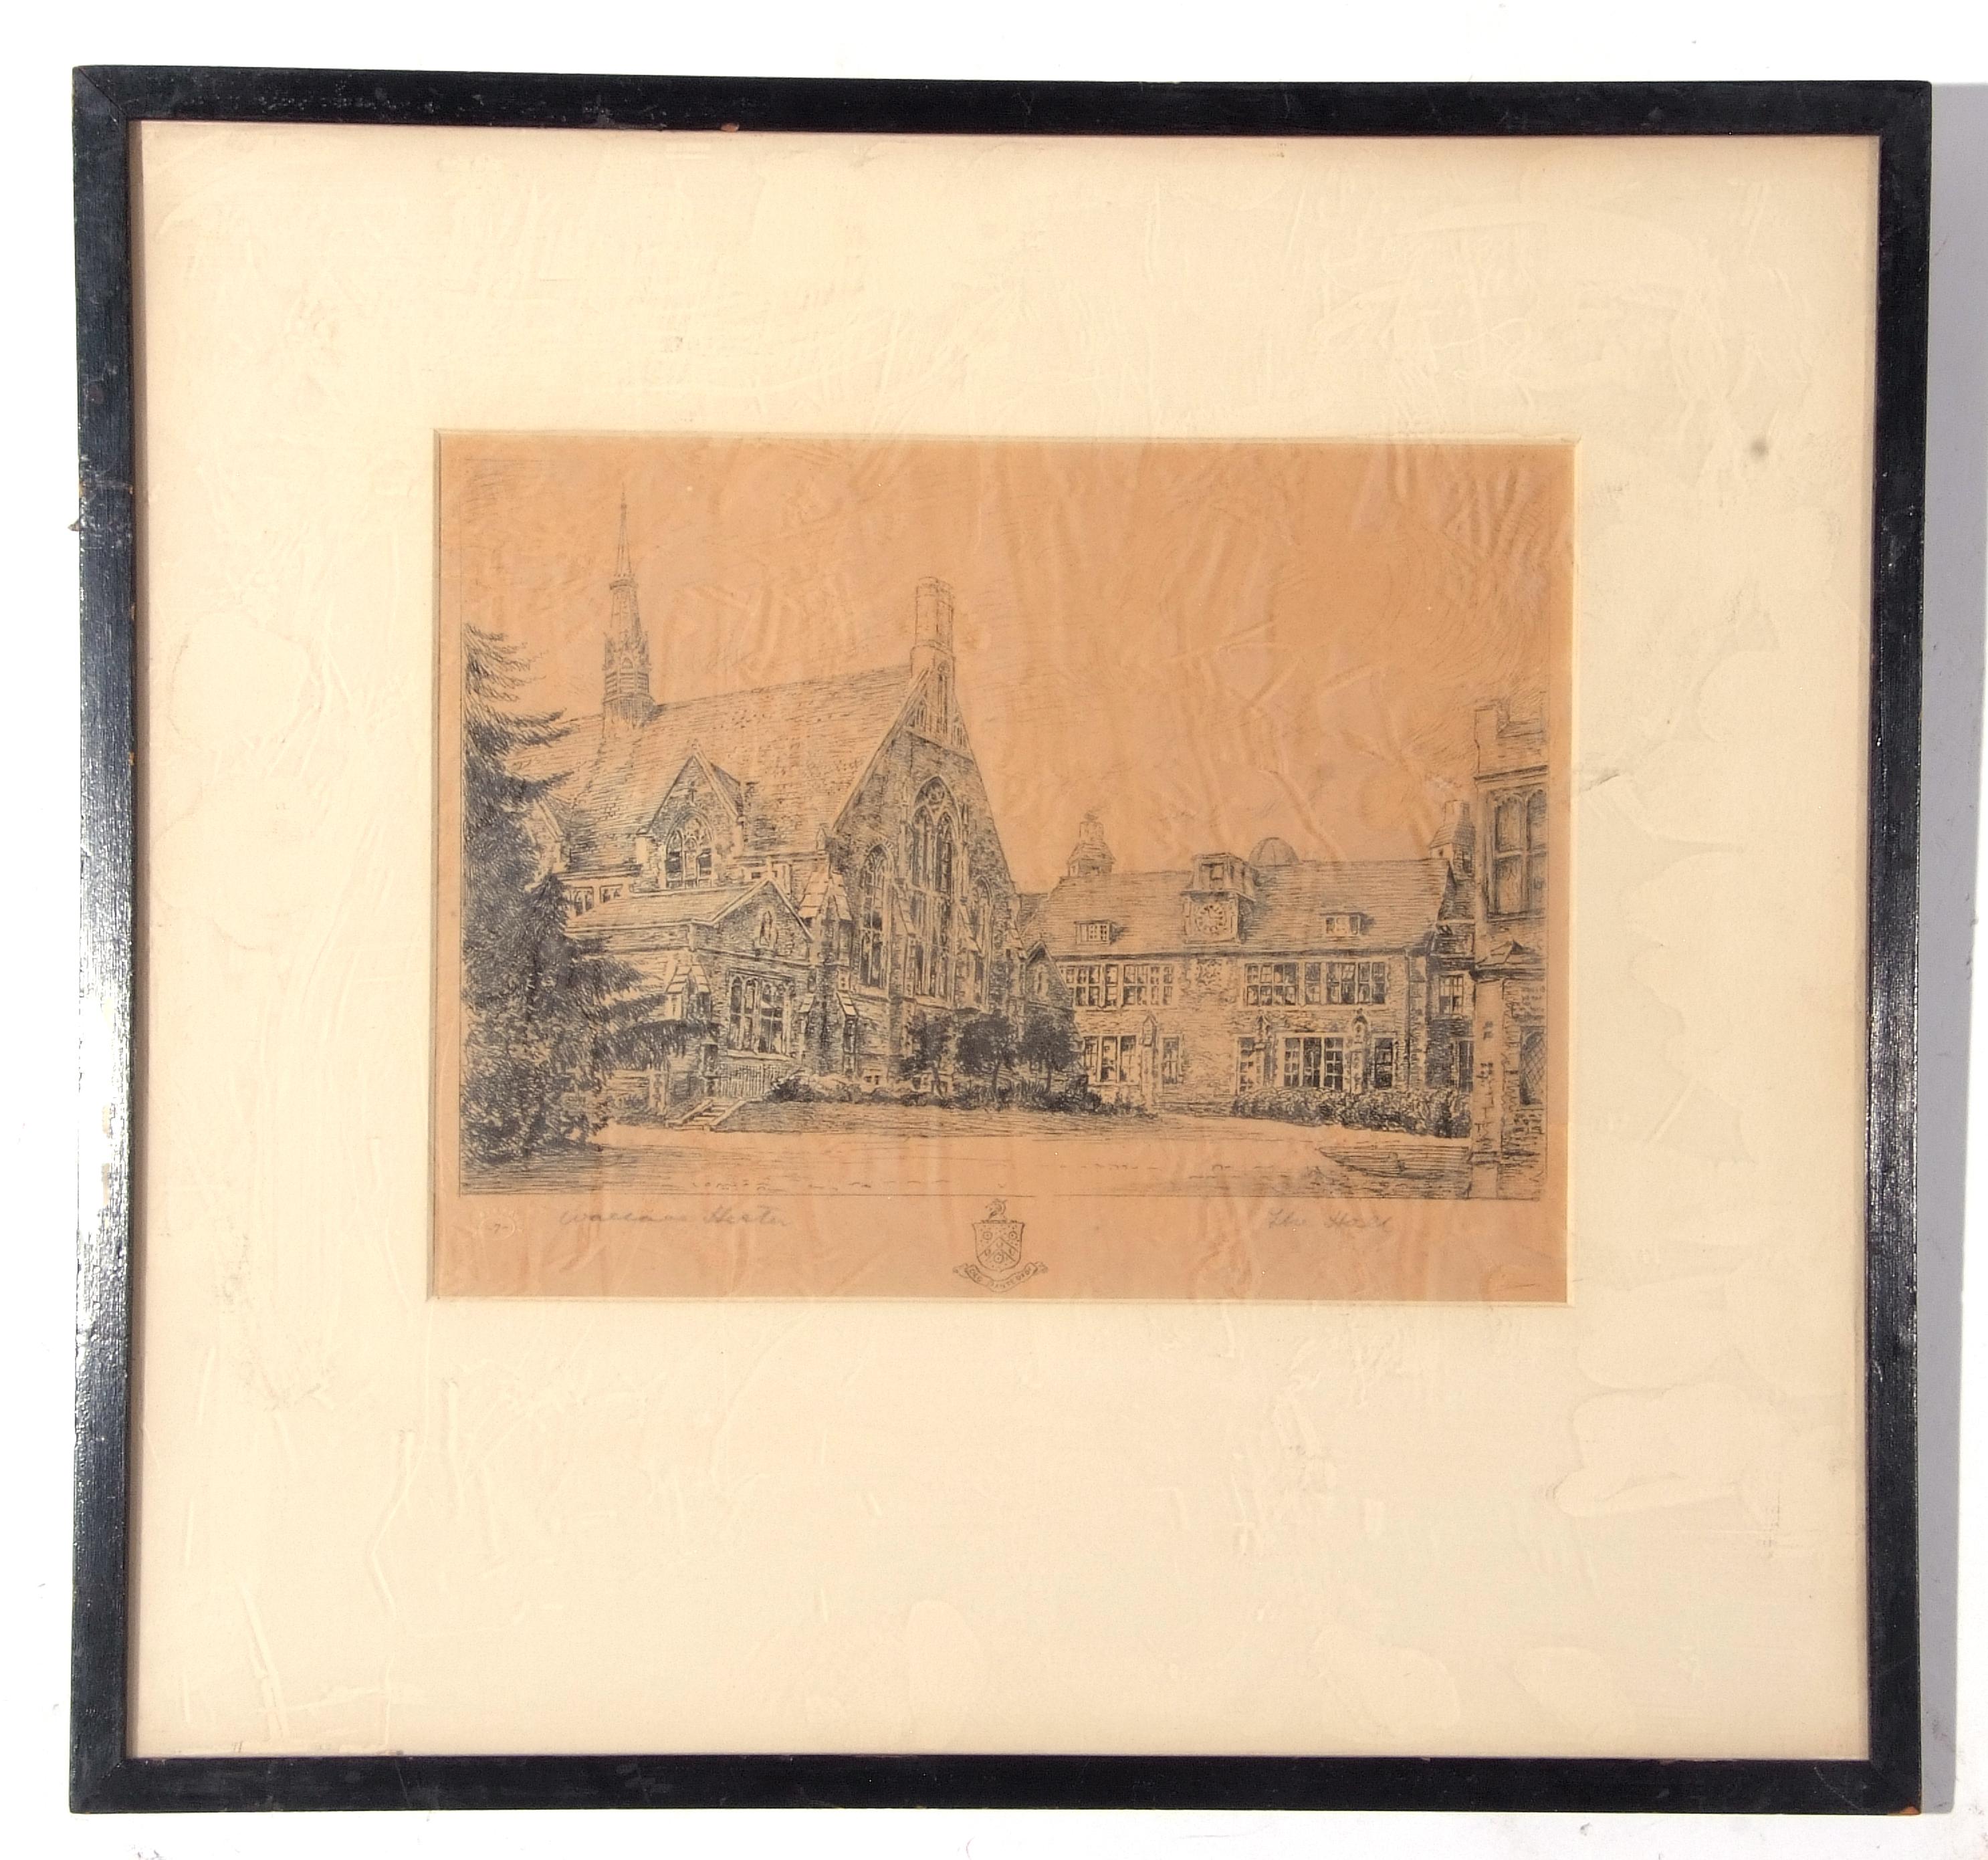 Three framed etchings, views of Charterhouse School, each 20 x 26cm - Image 2 of 3